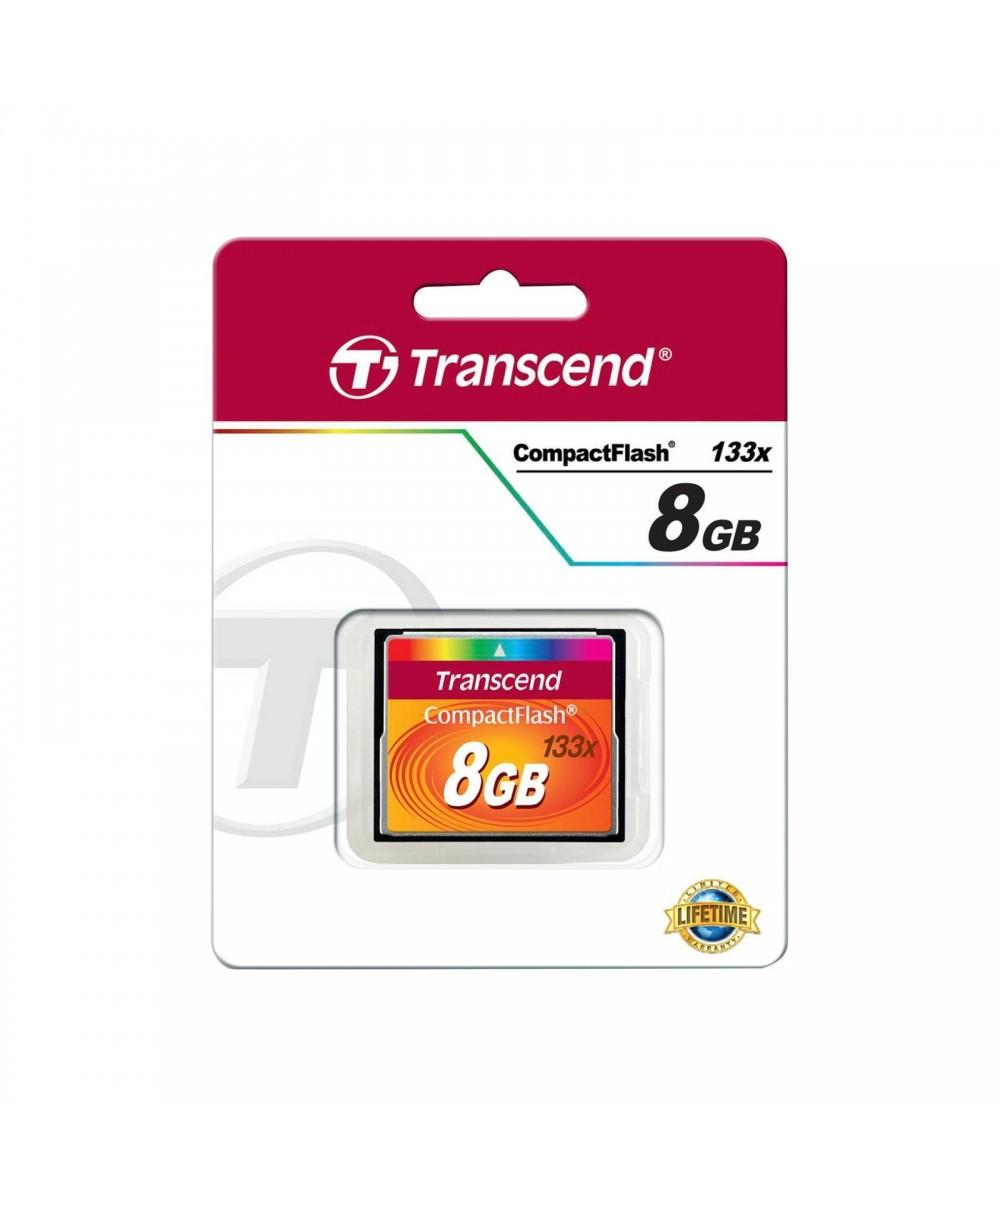 Transcend Compact Flash 8GB 133x Cartes Compact-Flash